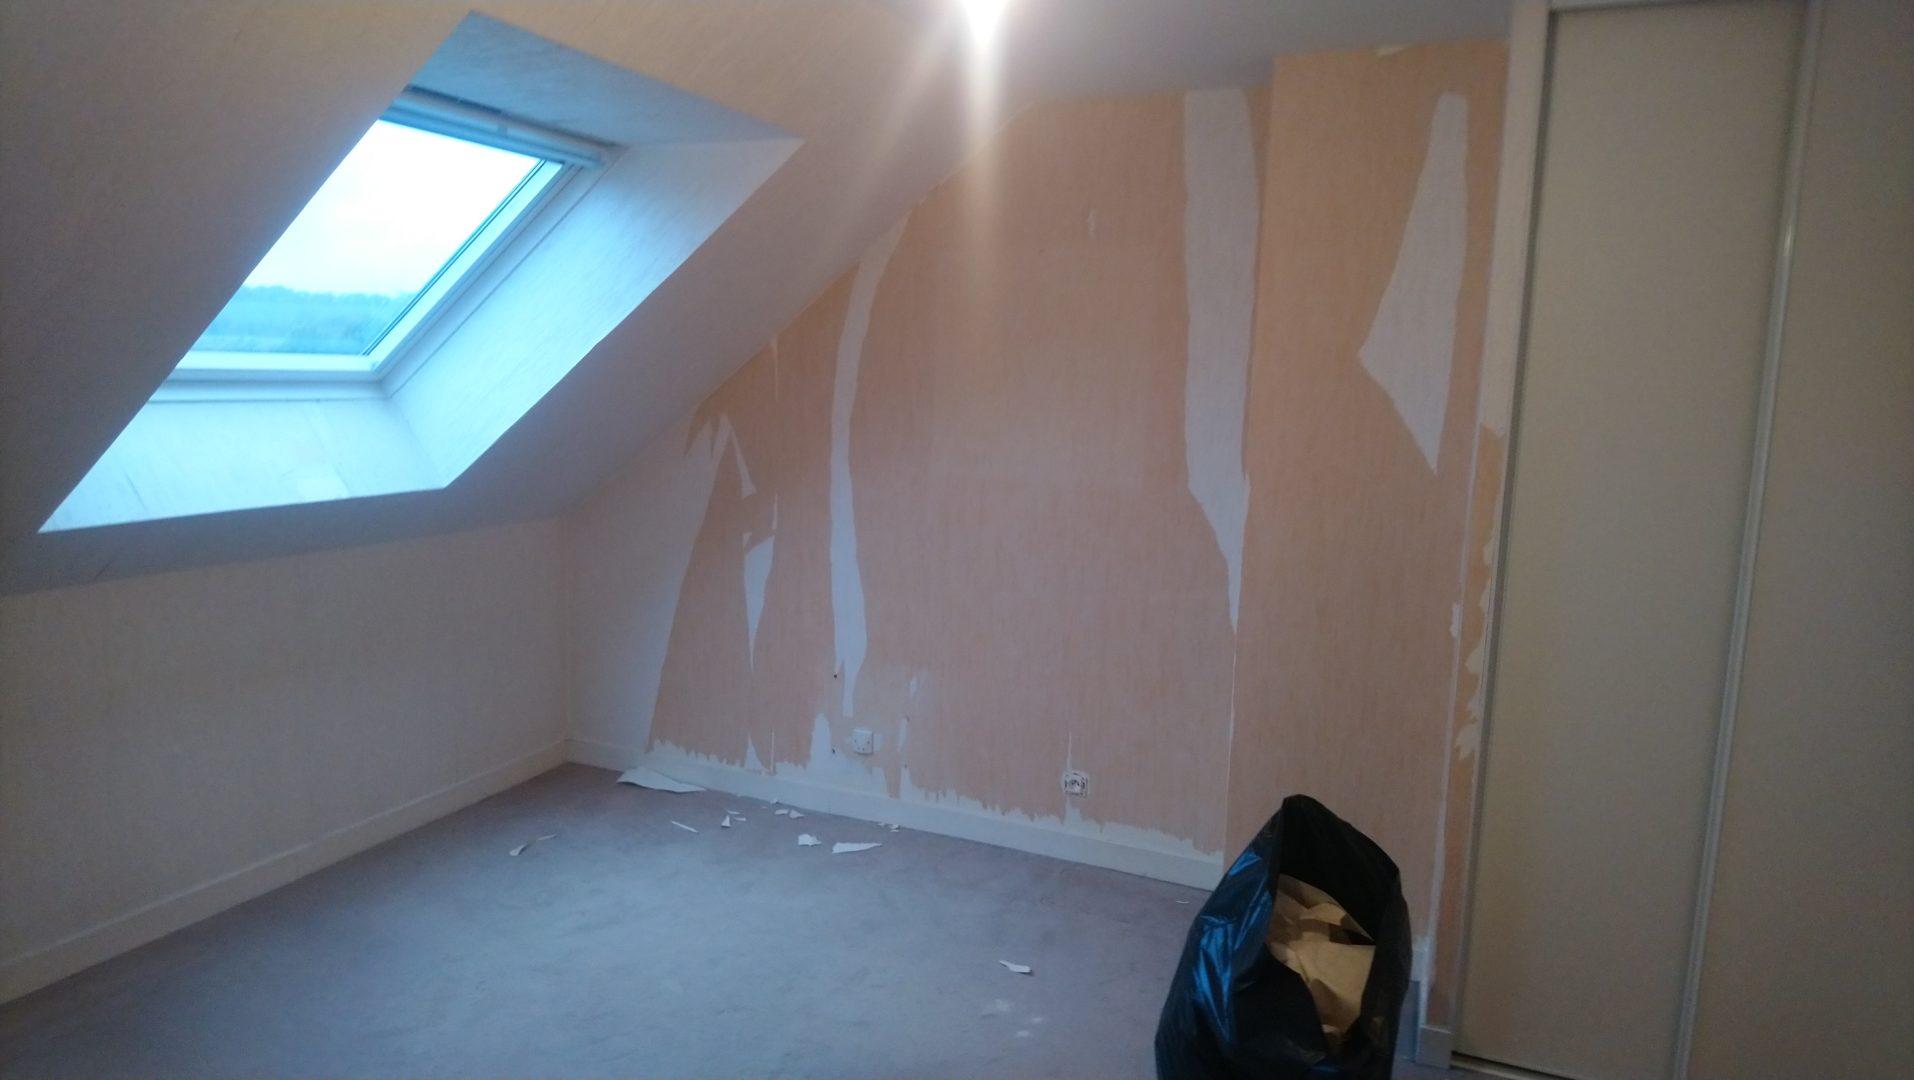 Kerfunten chambre decoration papier peint effet beto 4 - Décoration papier peint